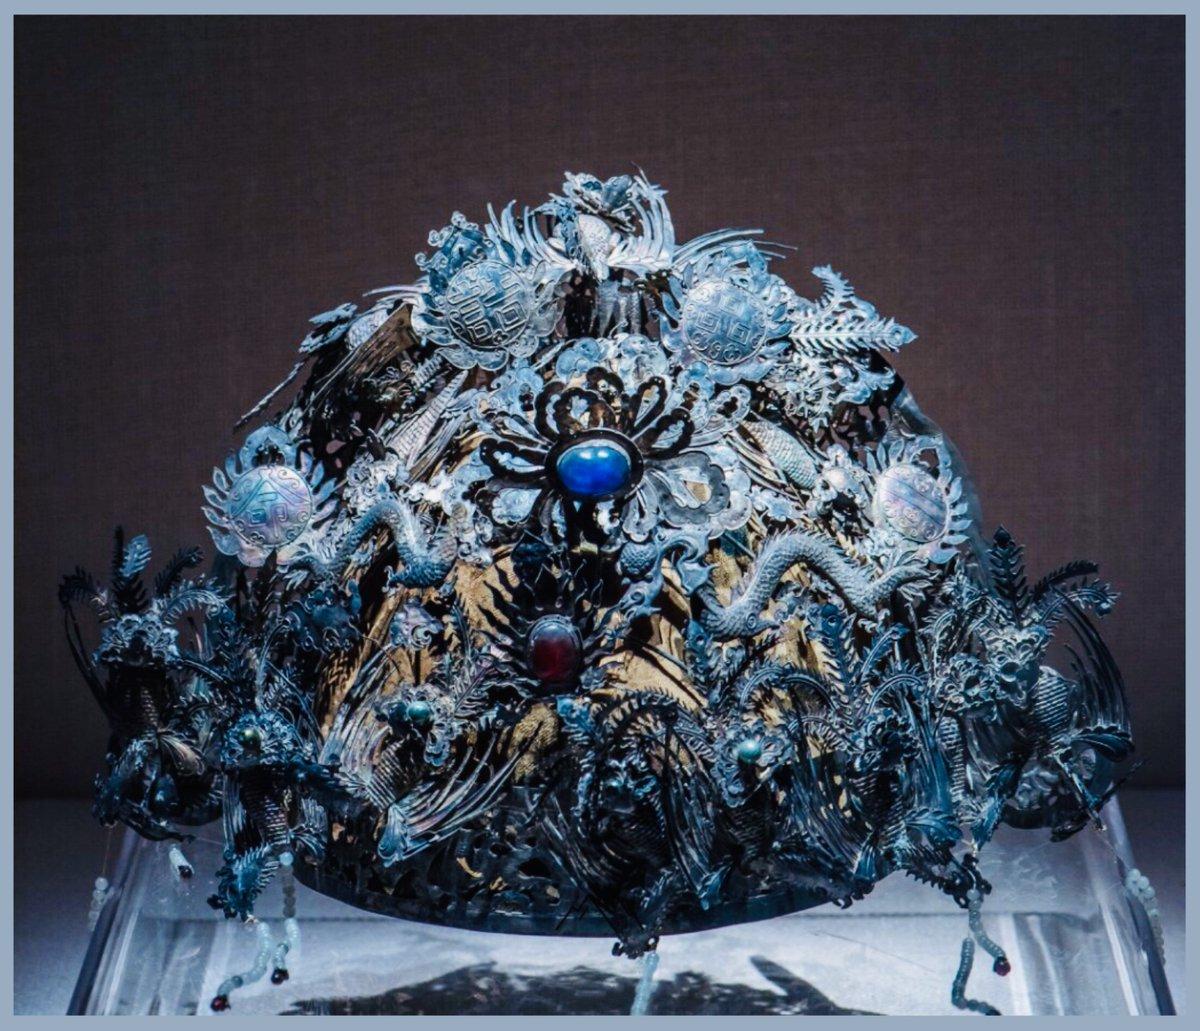 Ming Dynasty silver phoenix crown Location: Wuhan Museum   洪山區九峰山明代墓葬出土 【武漢博物館藏· 明代鑲寶石銀鳳冠】  #china  #hanfu  #chinese #chineseart https://t.co/D7gHhSAlM2